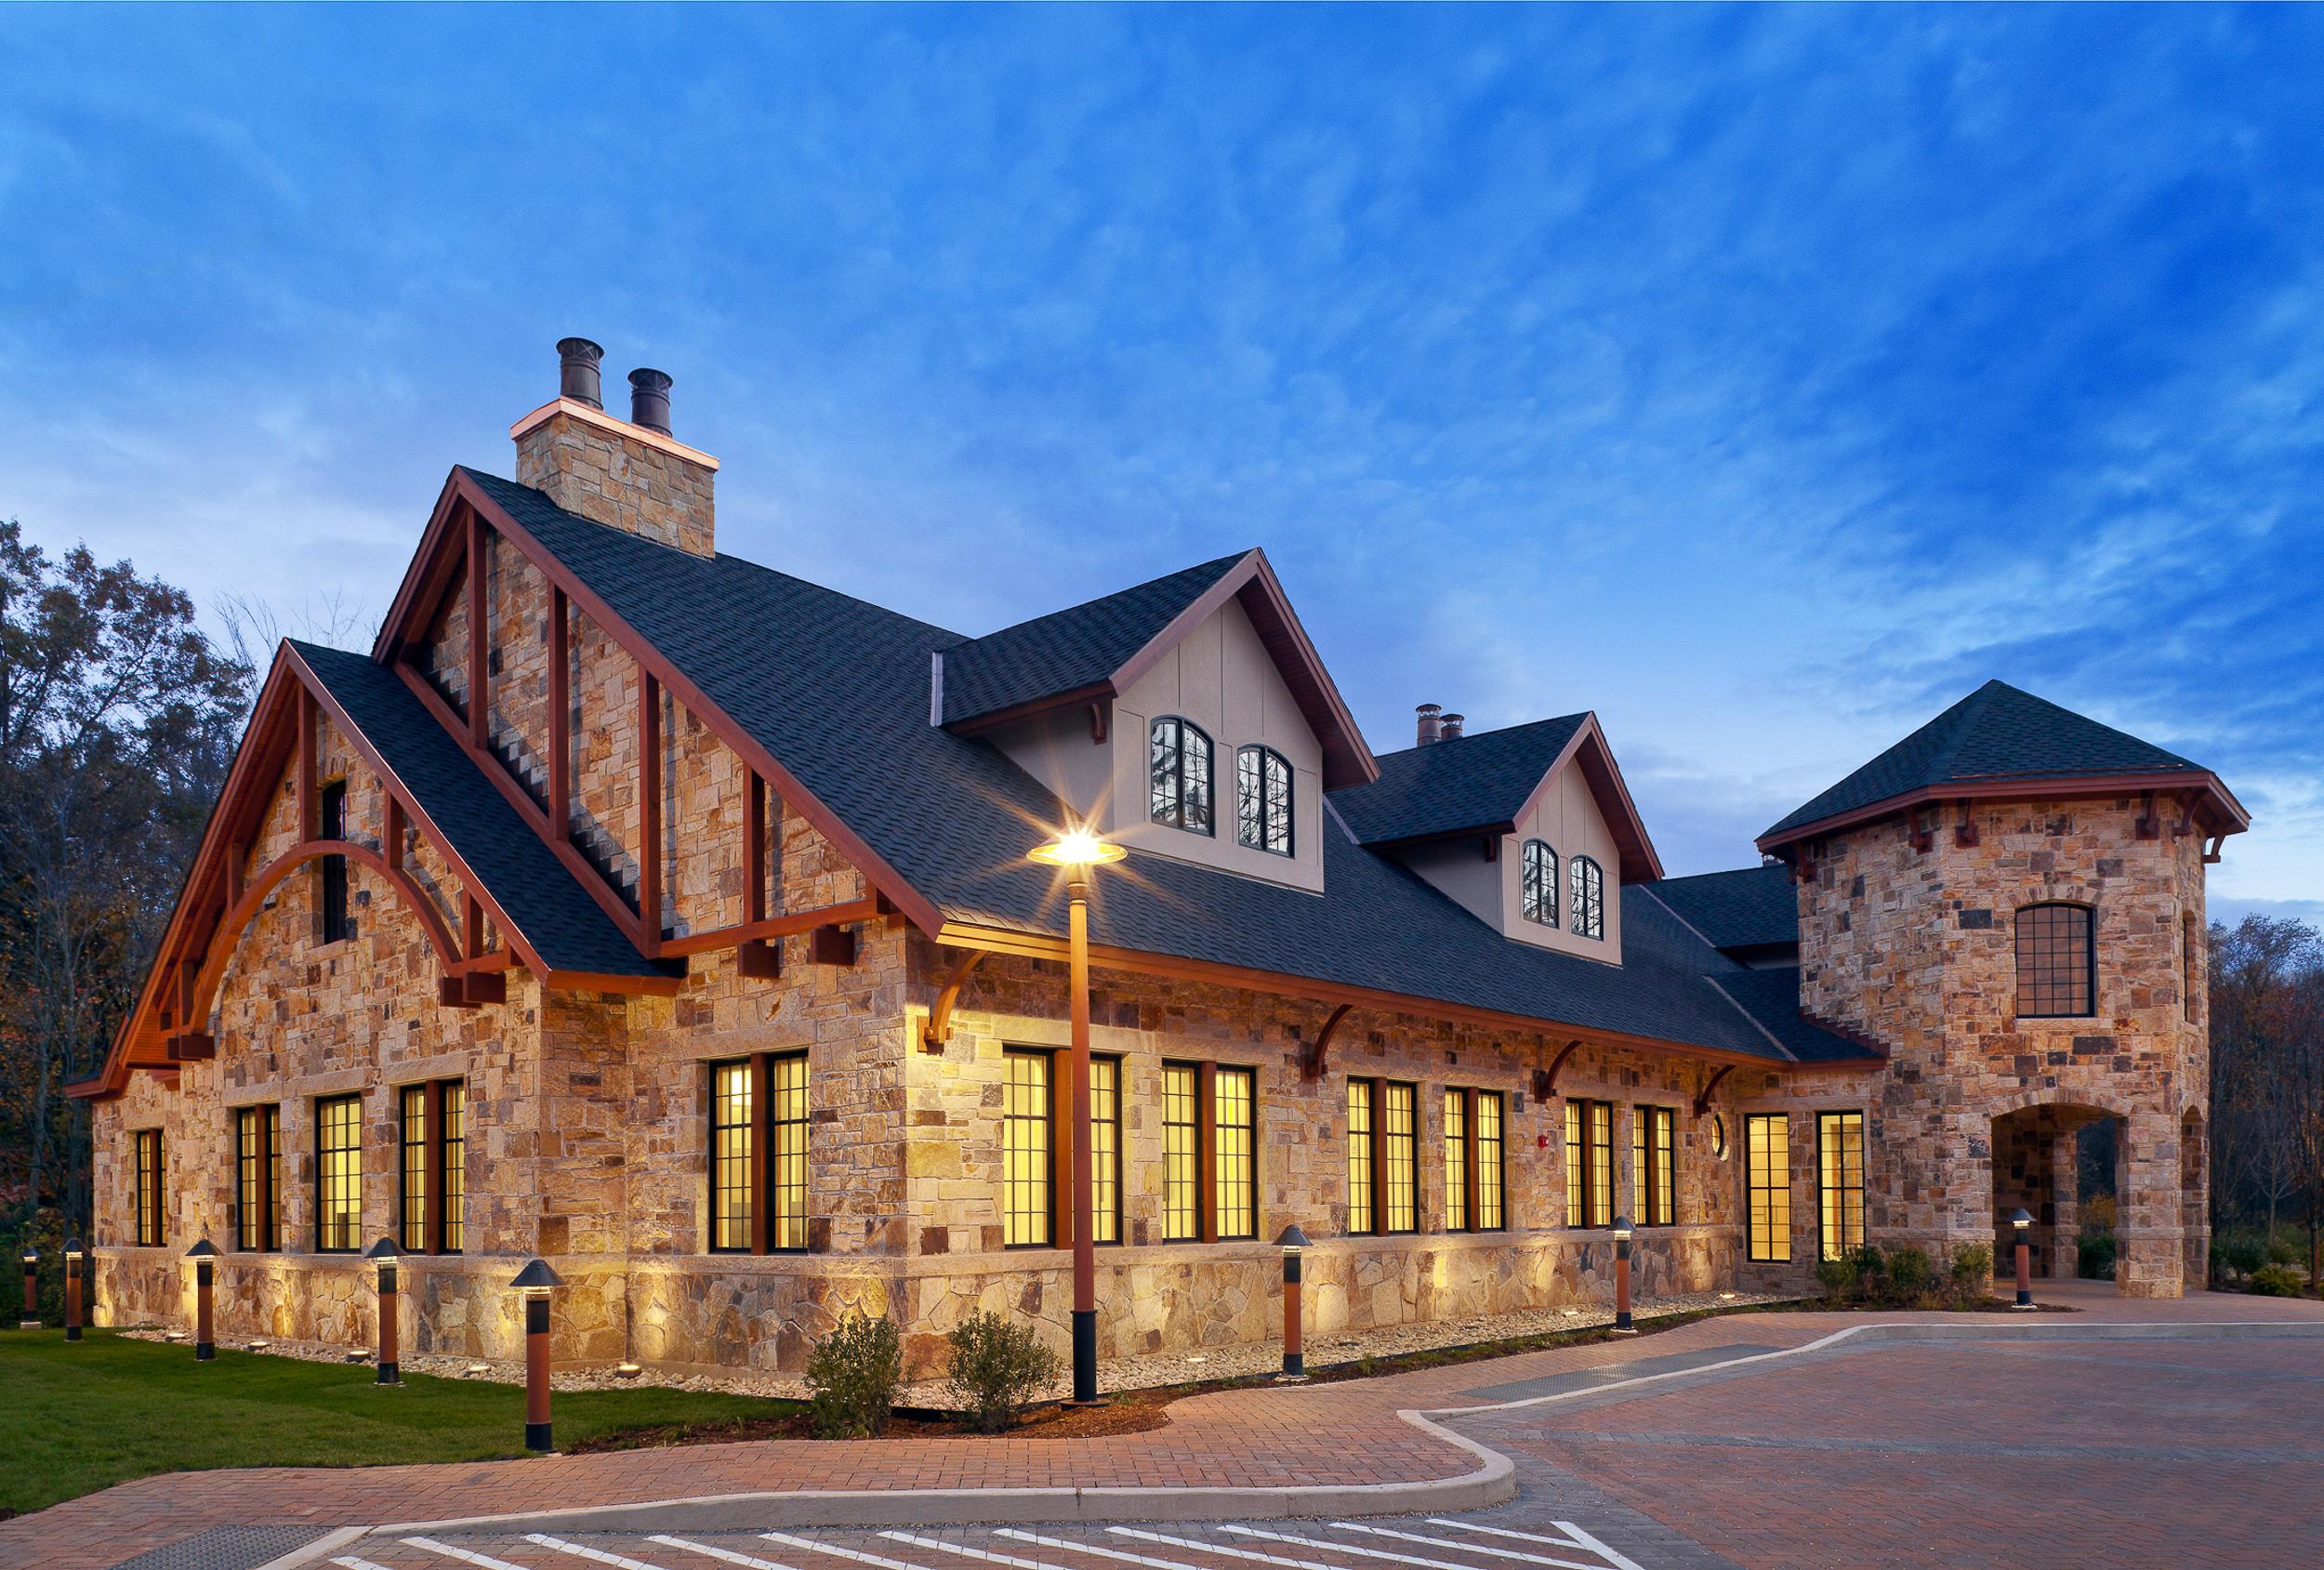 Acstar Insurance HQ, Farmington, CT at dusk by Quisenberry Arcari Malik Architects. © 2012 Carl Vernlund Photography